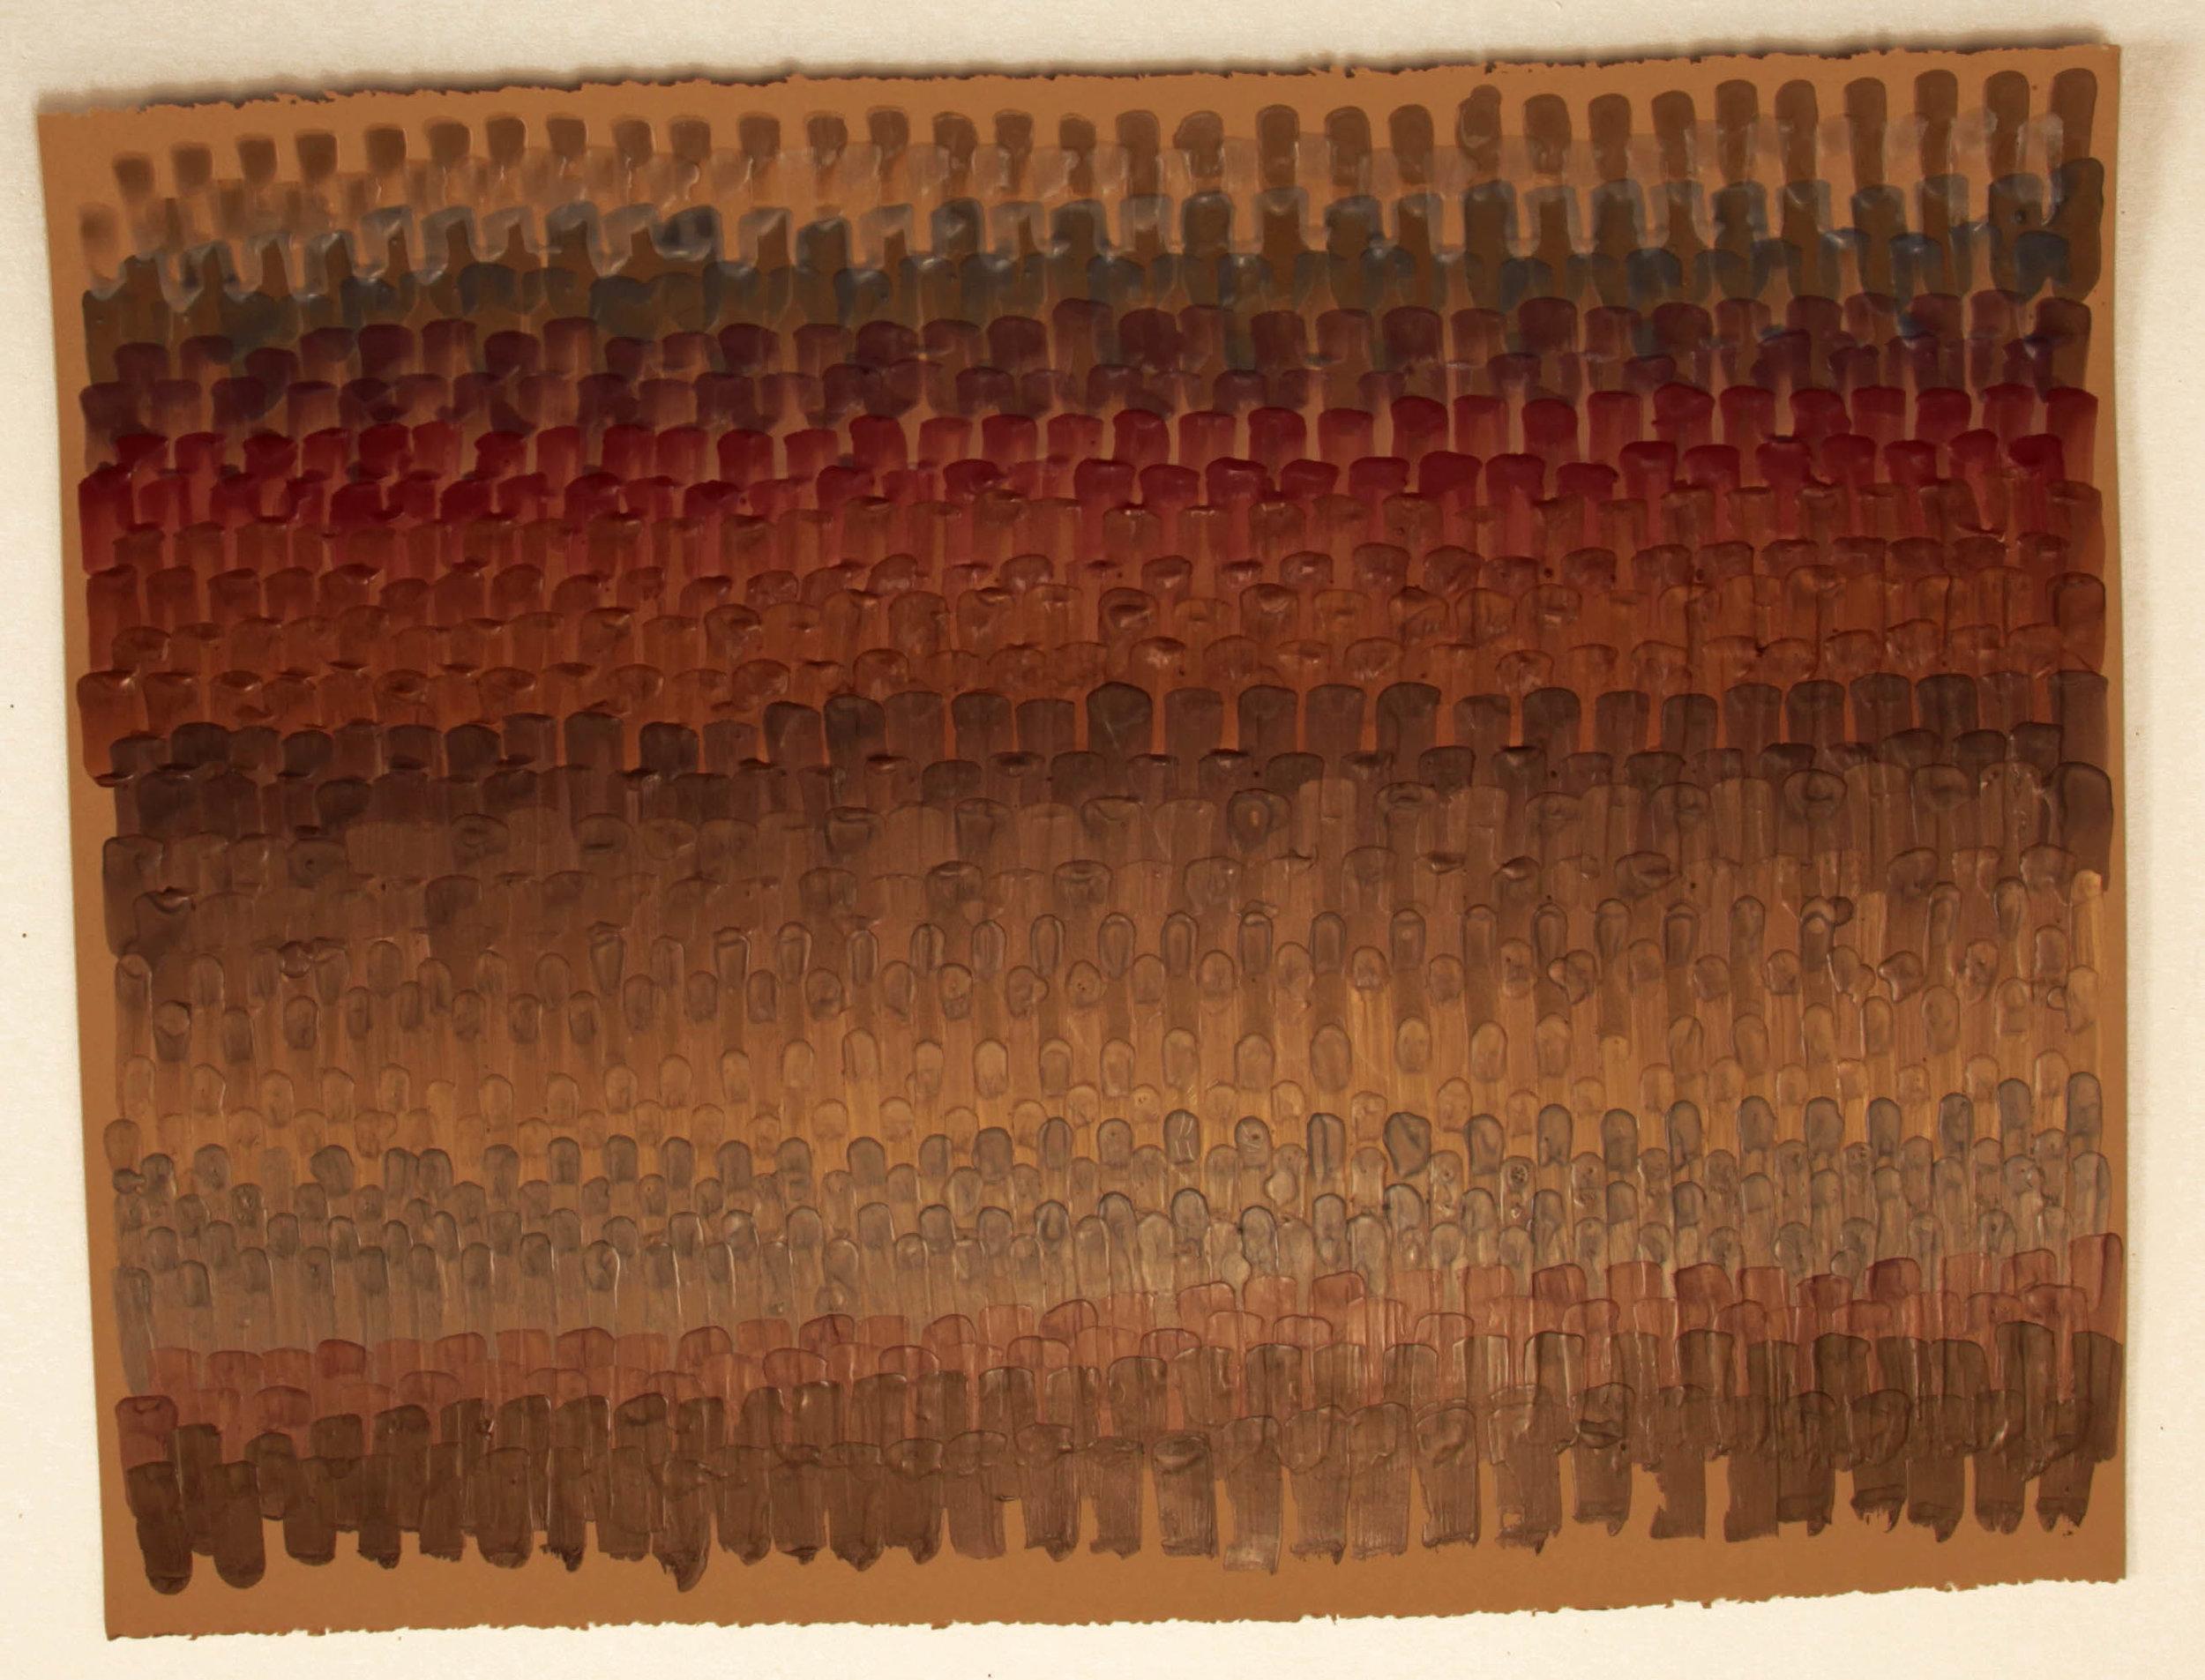 Serape 1, 2016, Encaustic on acid-free paper, 30 x 22-1/2 inches